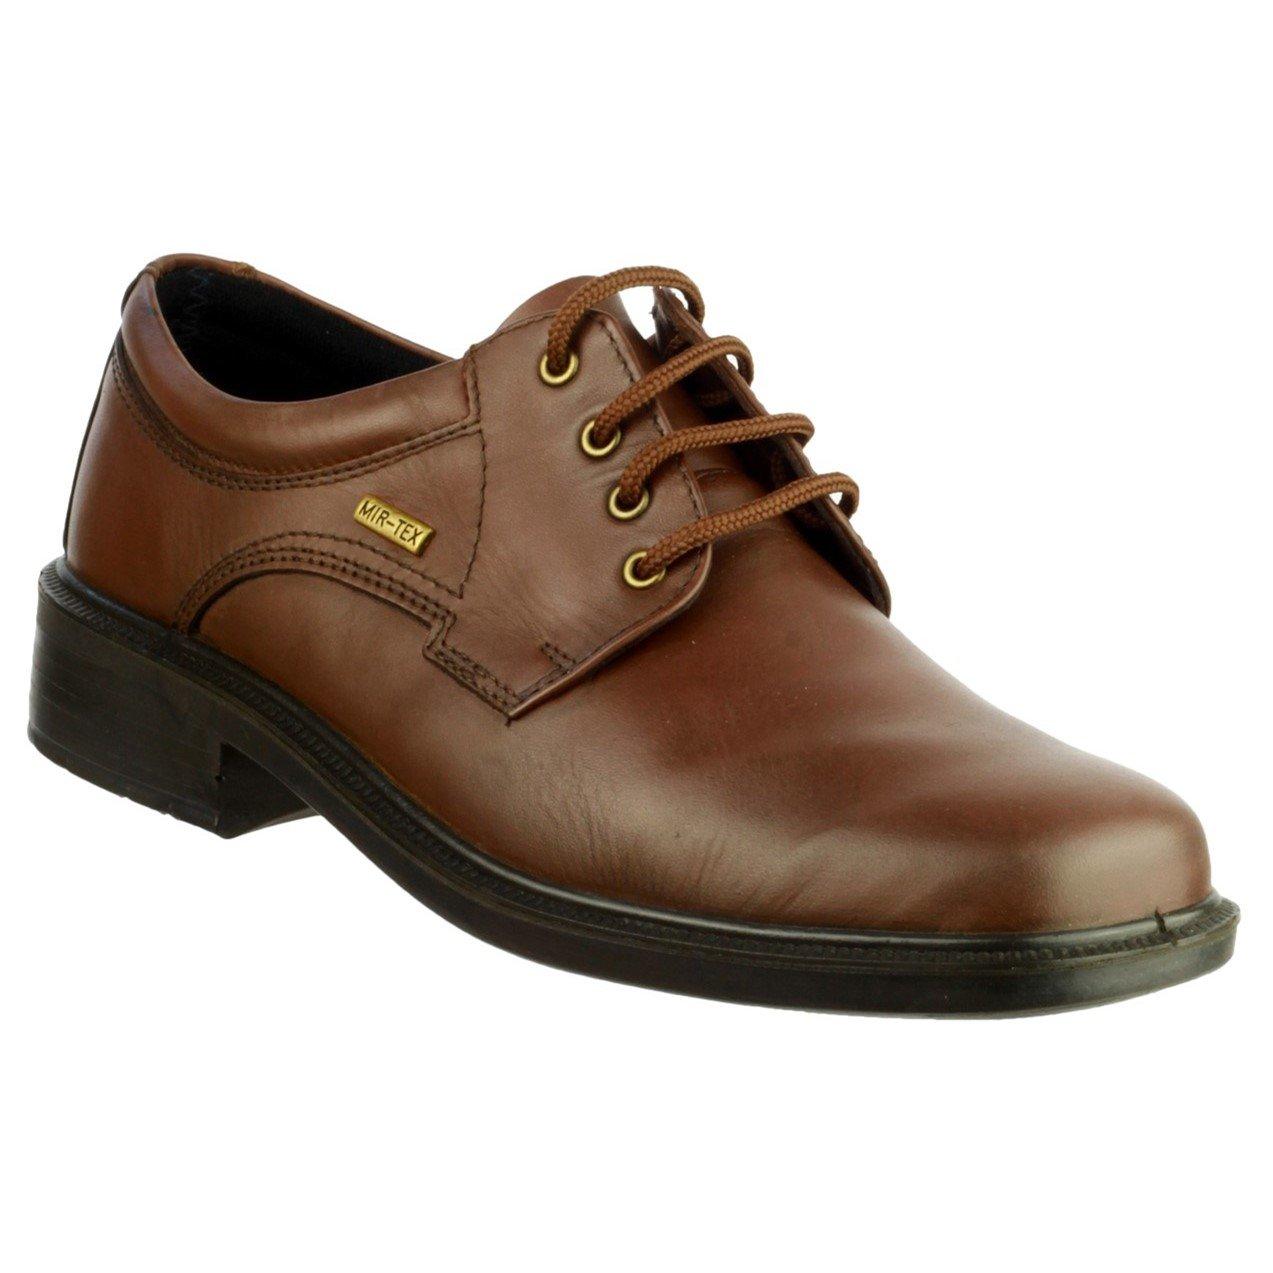 Cotswold Men's Sudeley Waterproof Shoe Various Colours 32970 - Brown 8